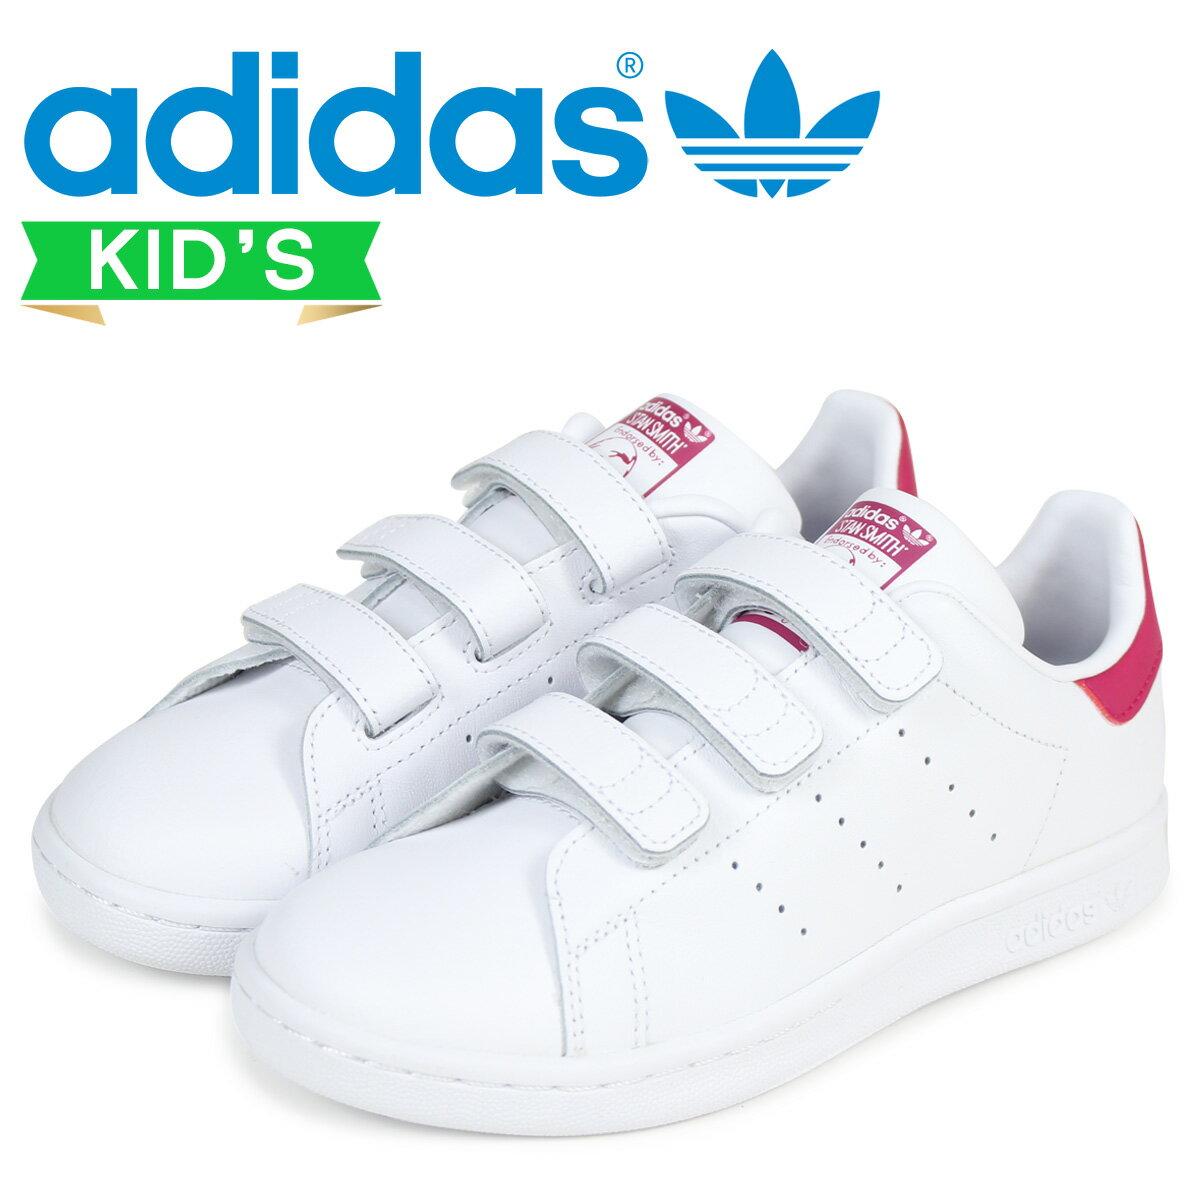 adidas Originals スタンスミス キッズ アディダス スニーカー STAN SMITH CF C B32706 靴 ホワイト 【決算セール】